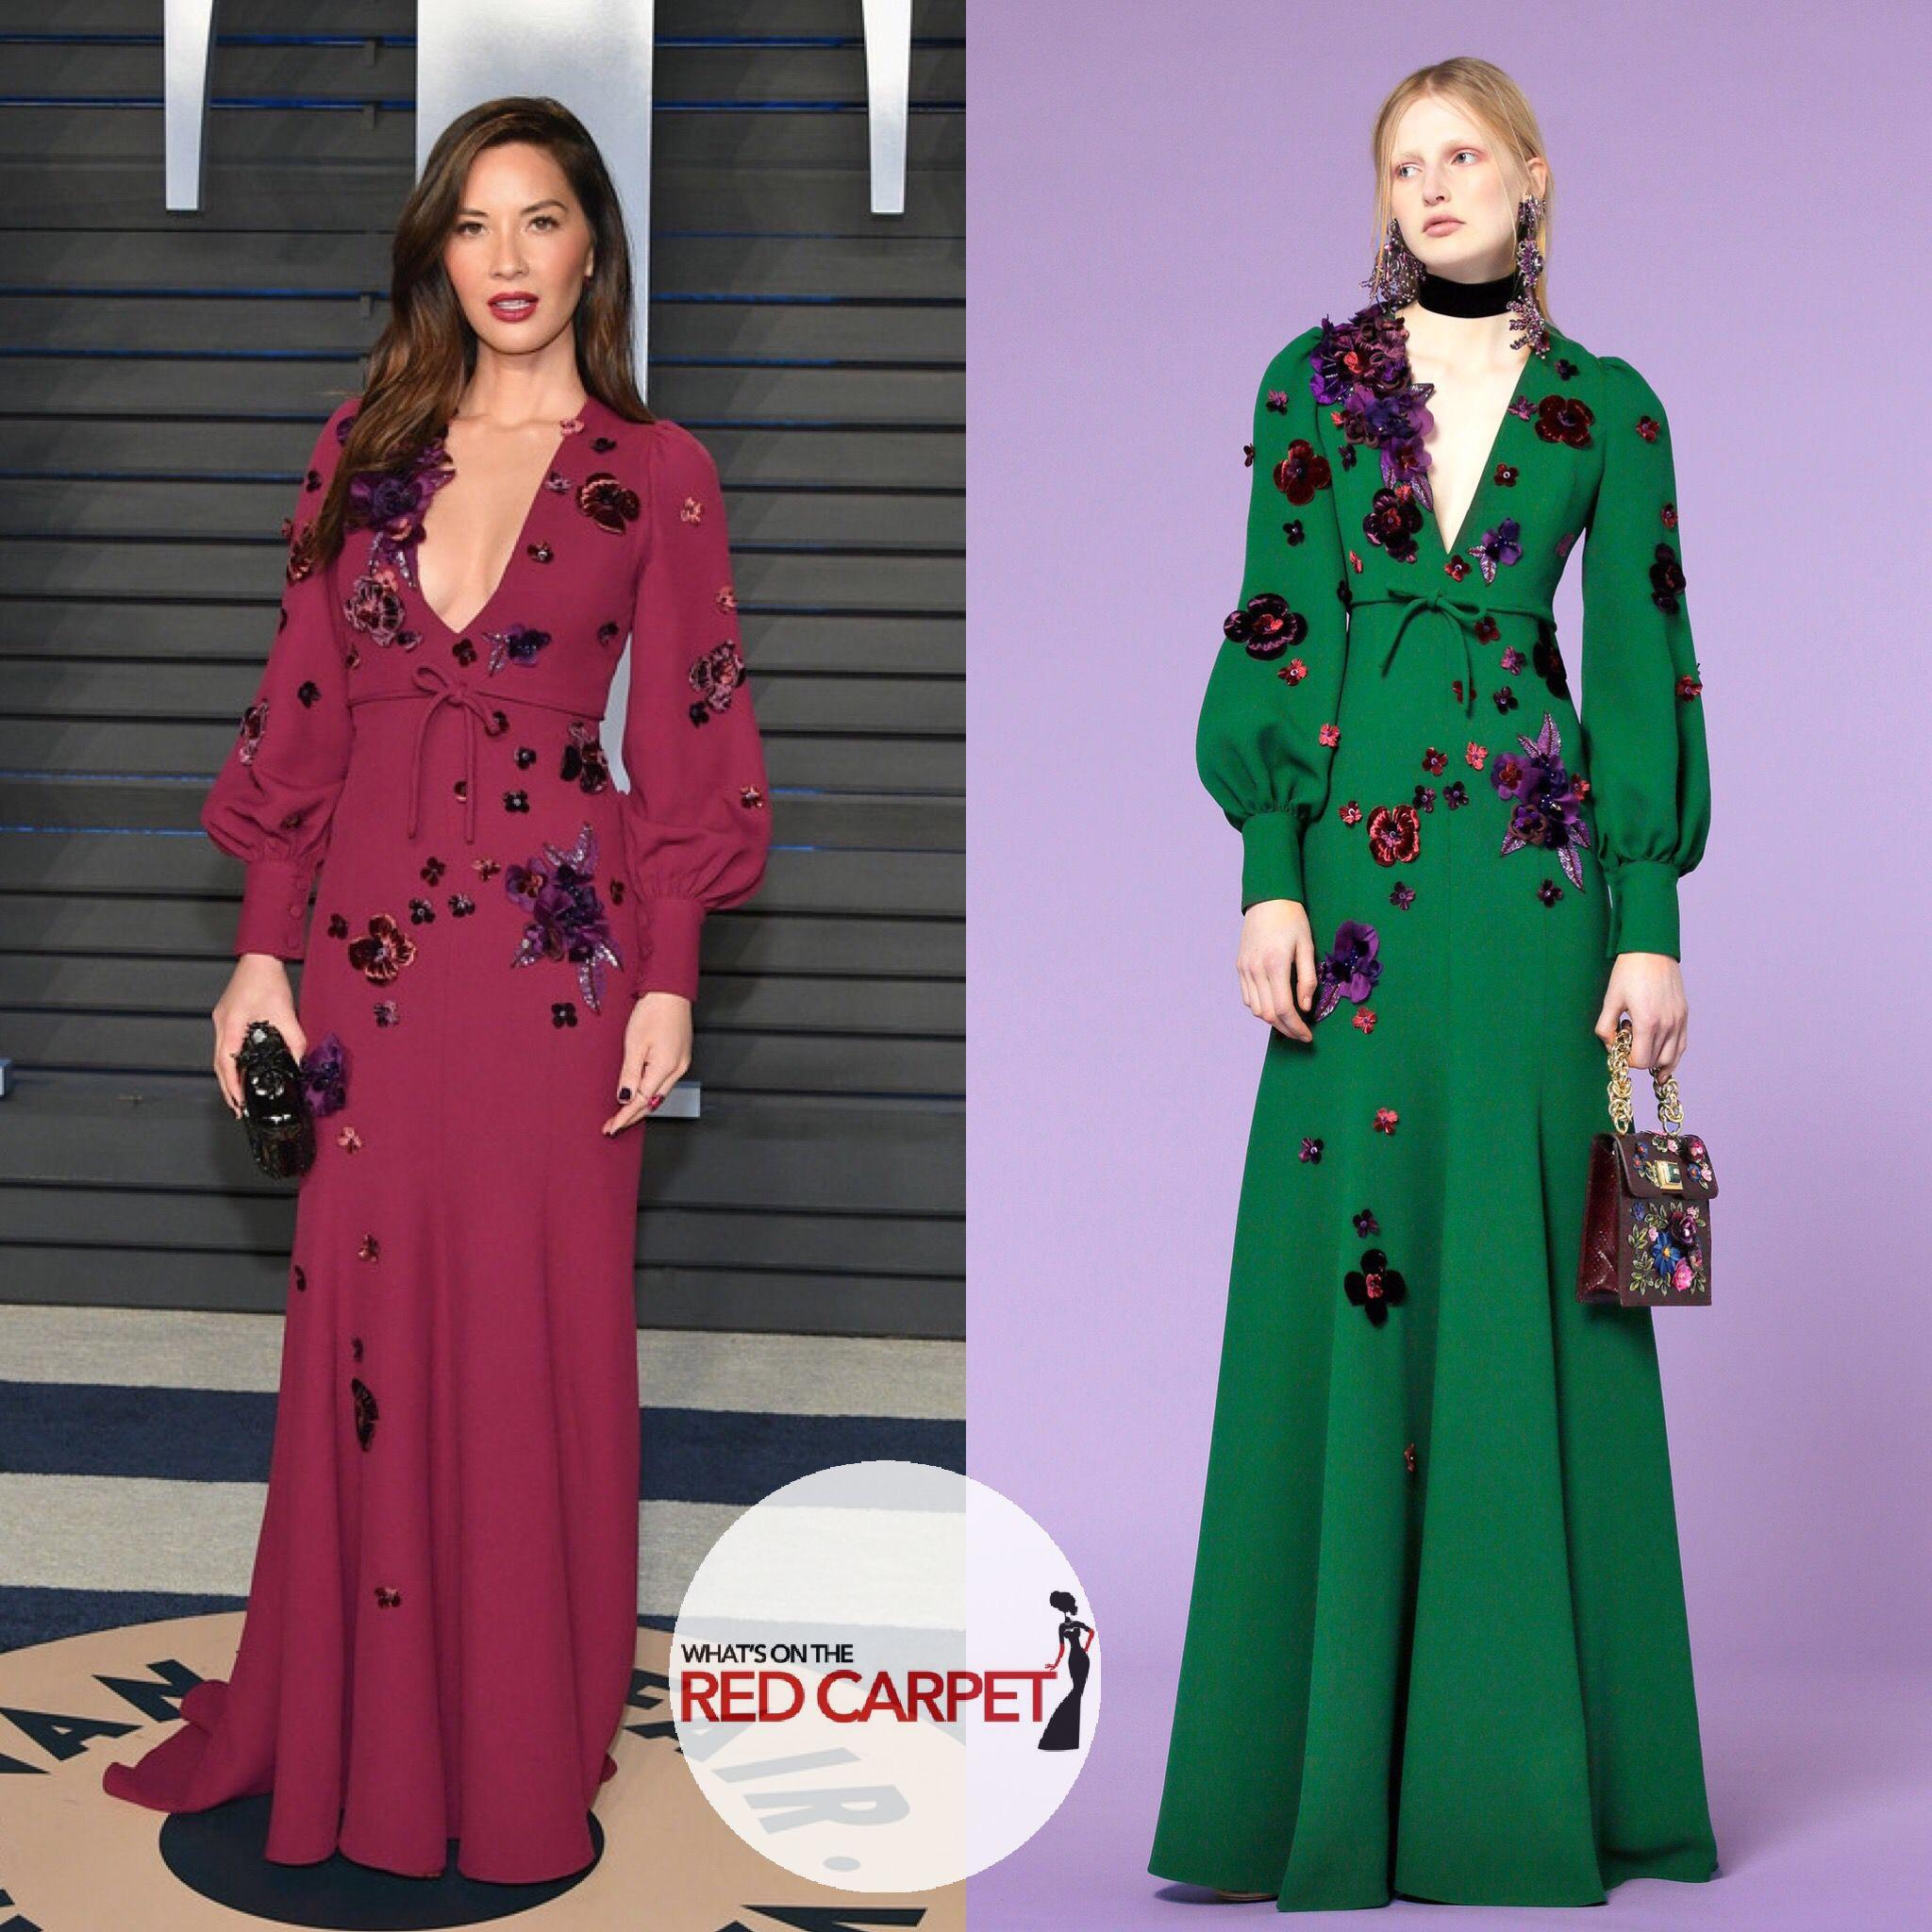 2018 oscars 90th academy awards fashion